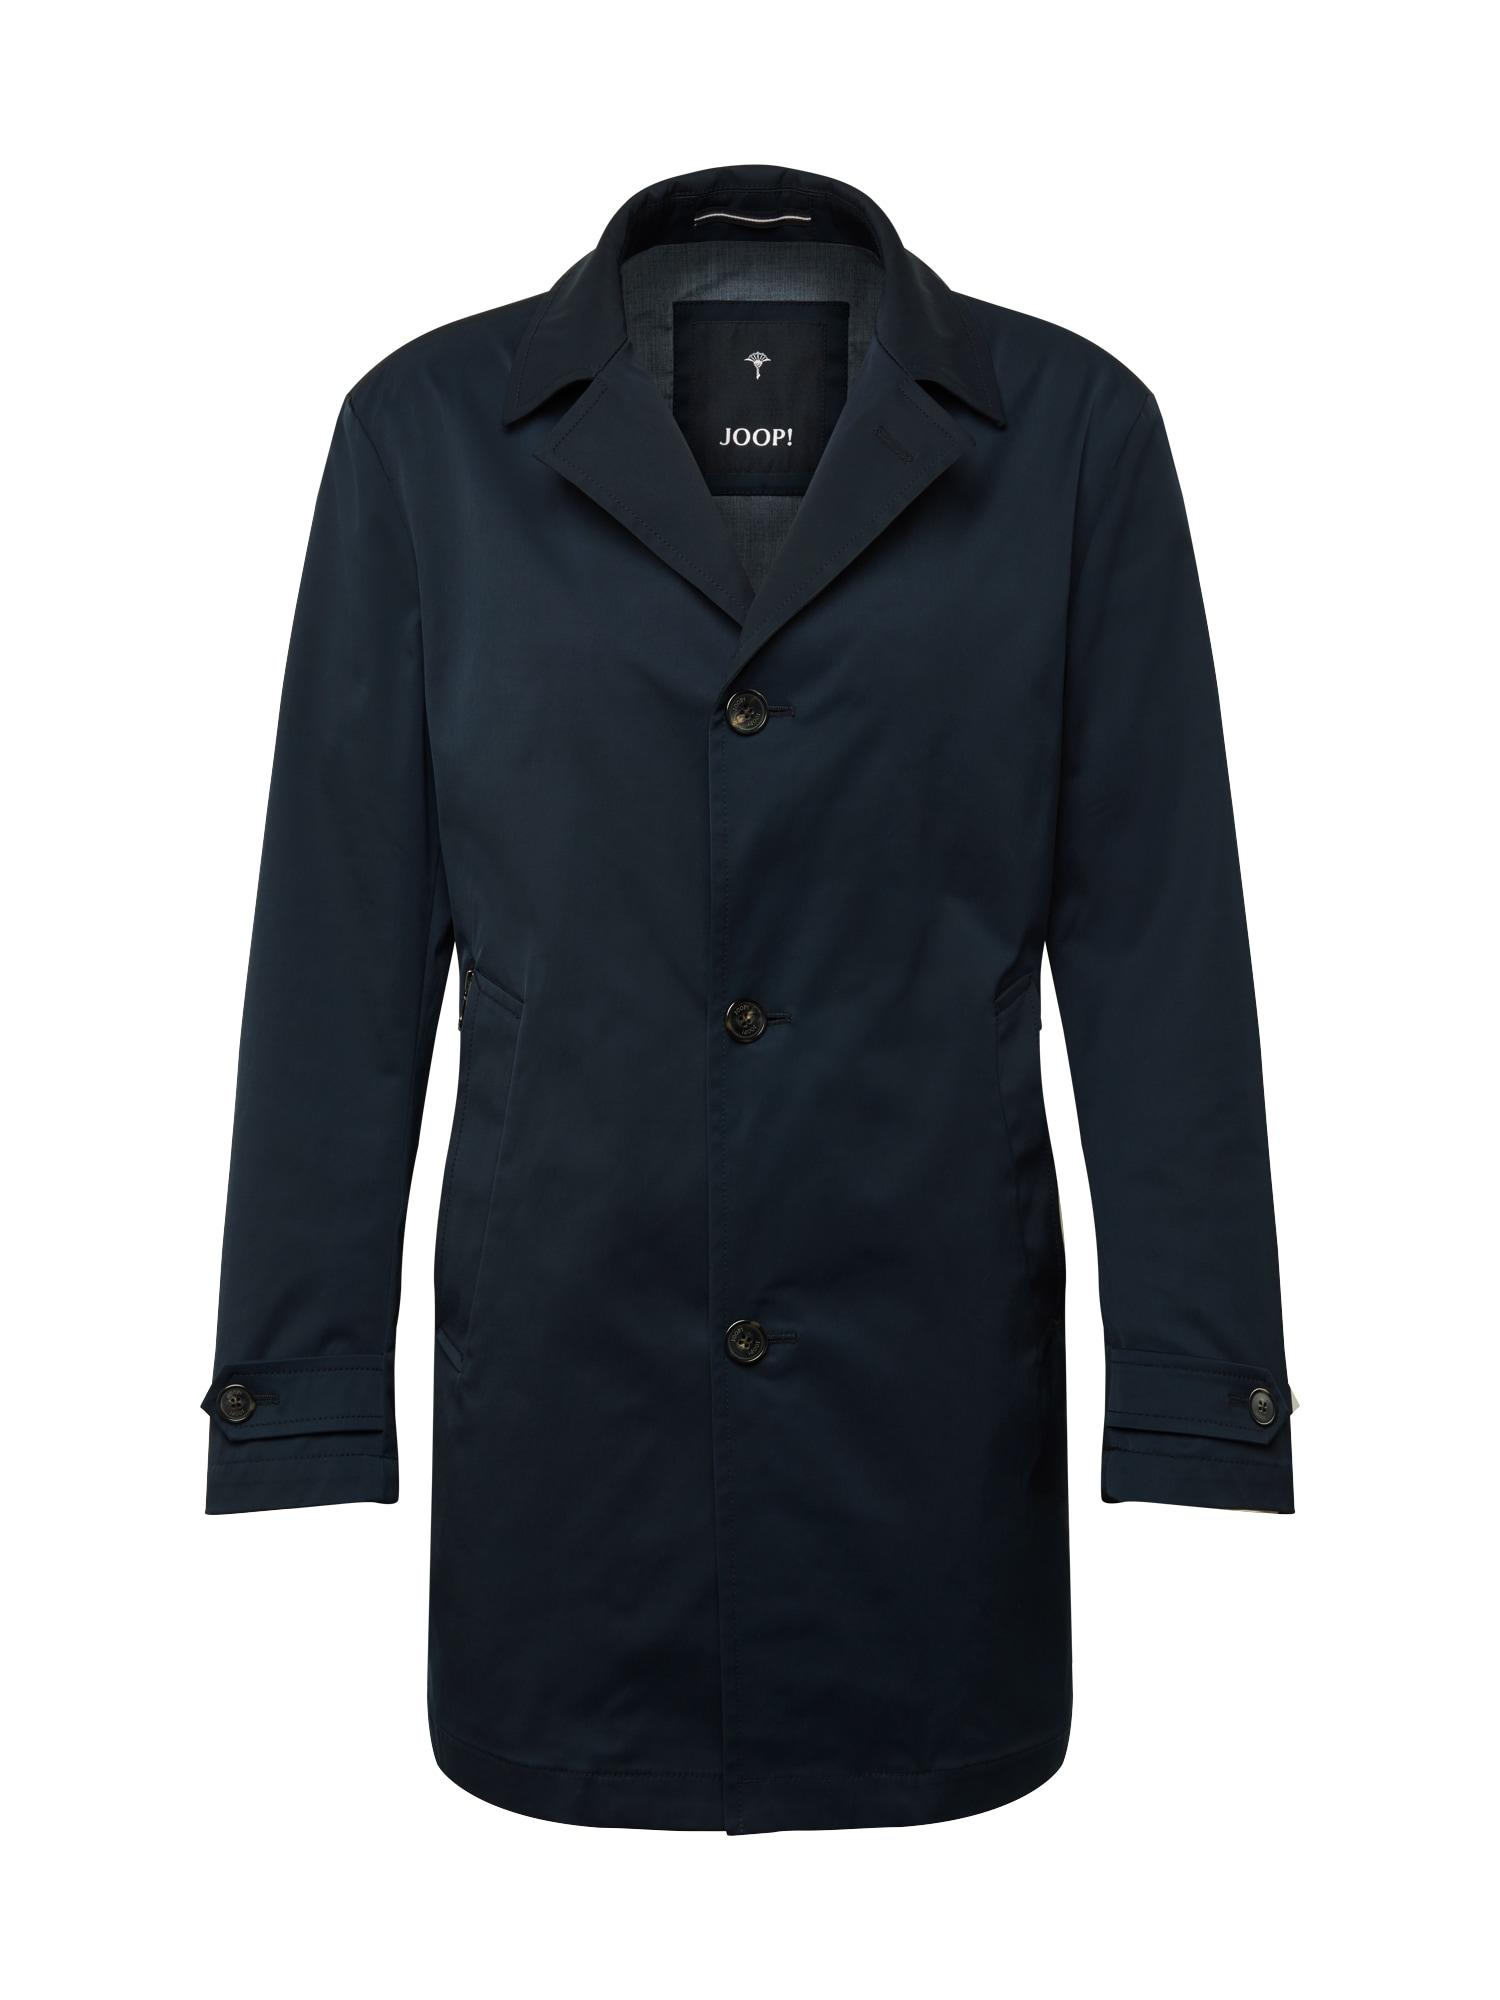 Přechodný kabát 17 JC-49Andrews 10002710 tmavě modrá JOOP!